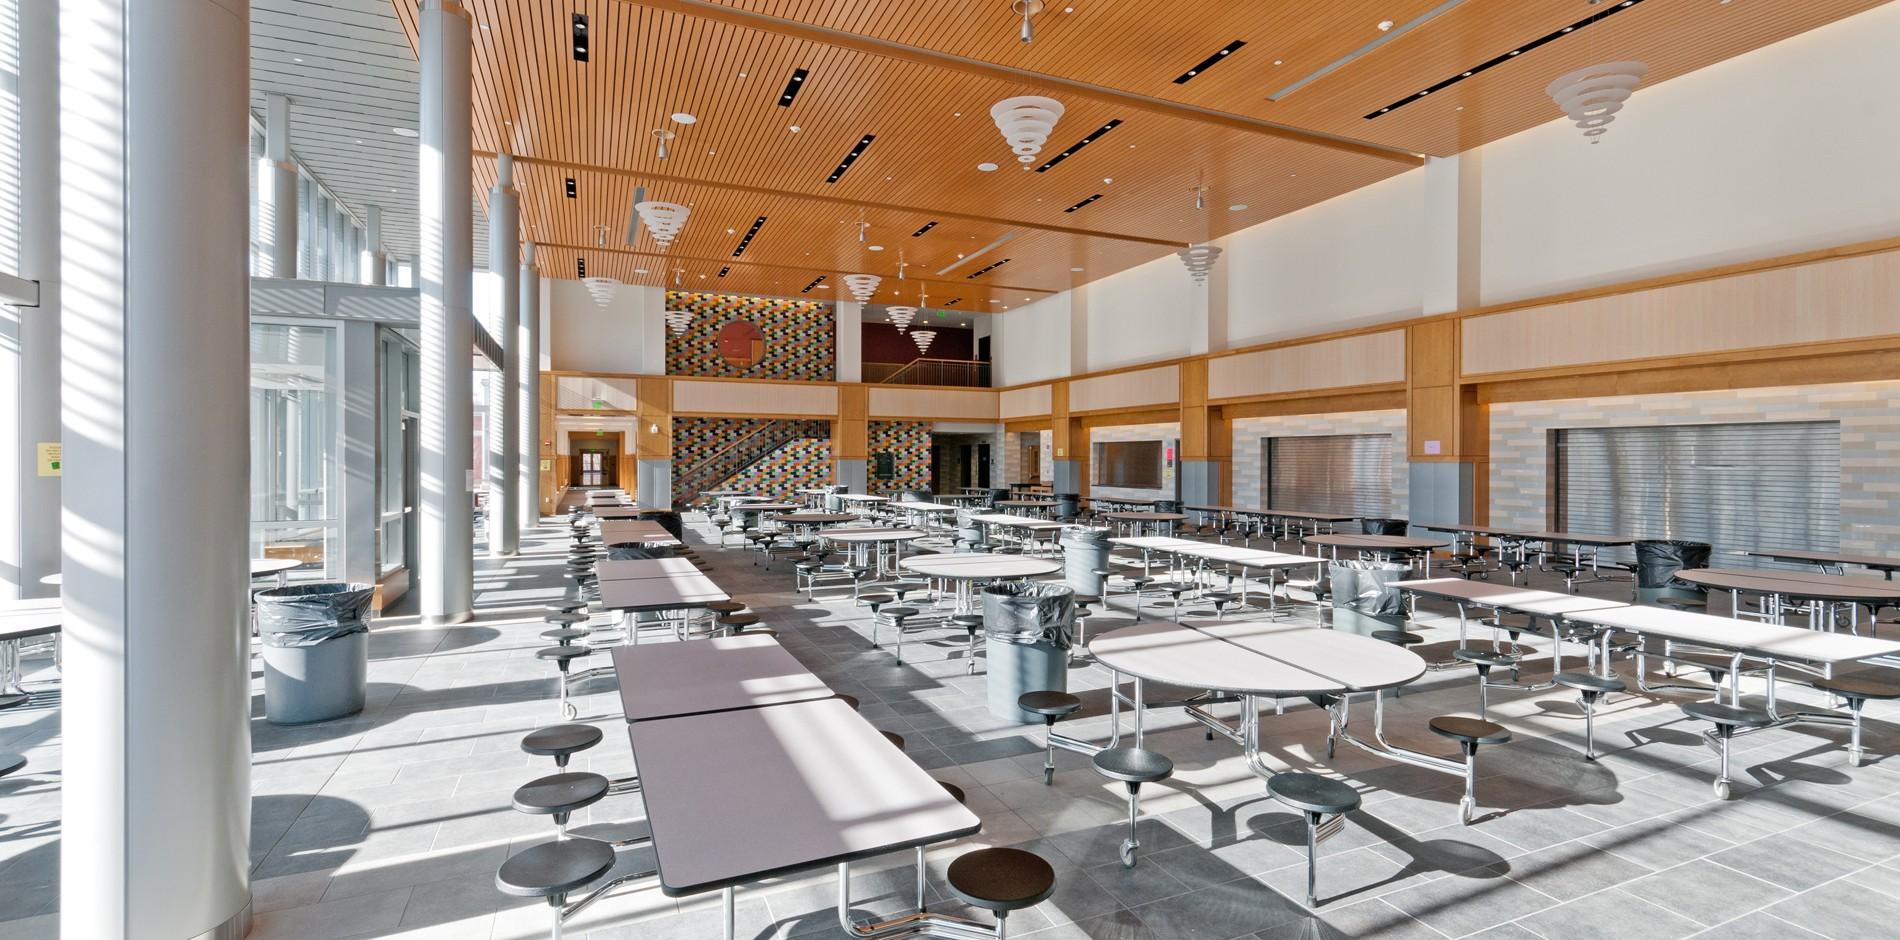 wayland  ma high school renovation  addition  u0026 ground up